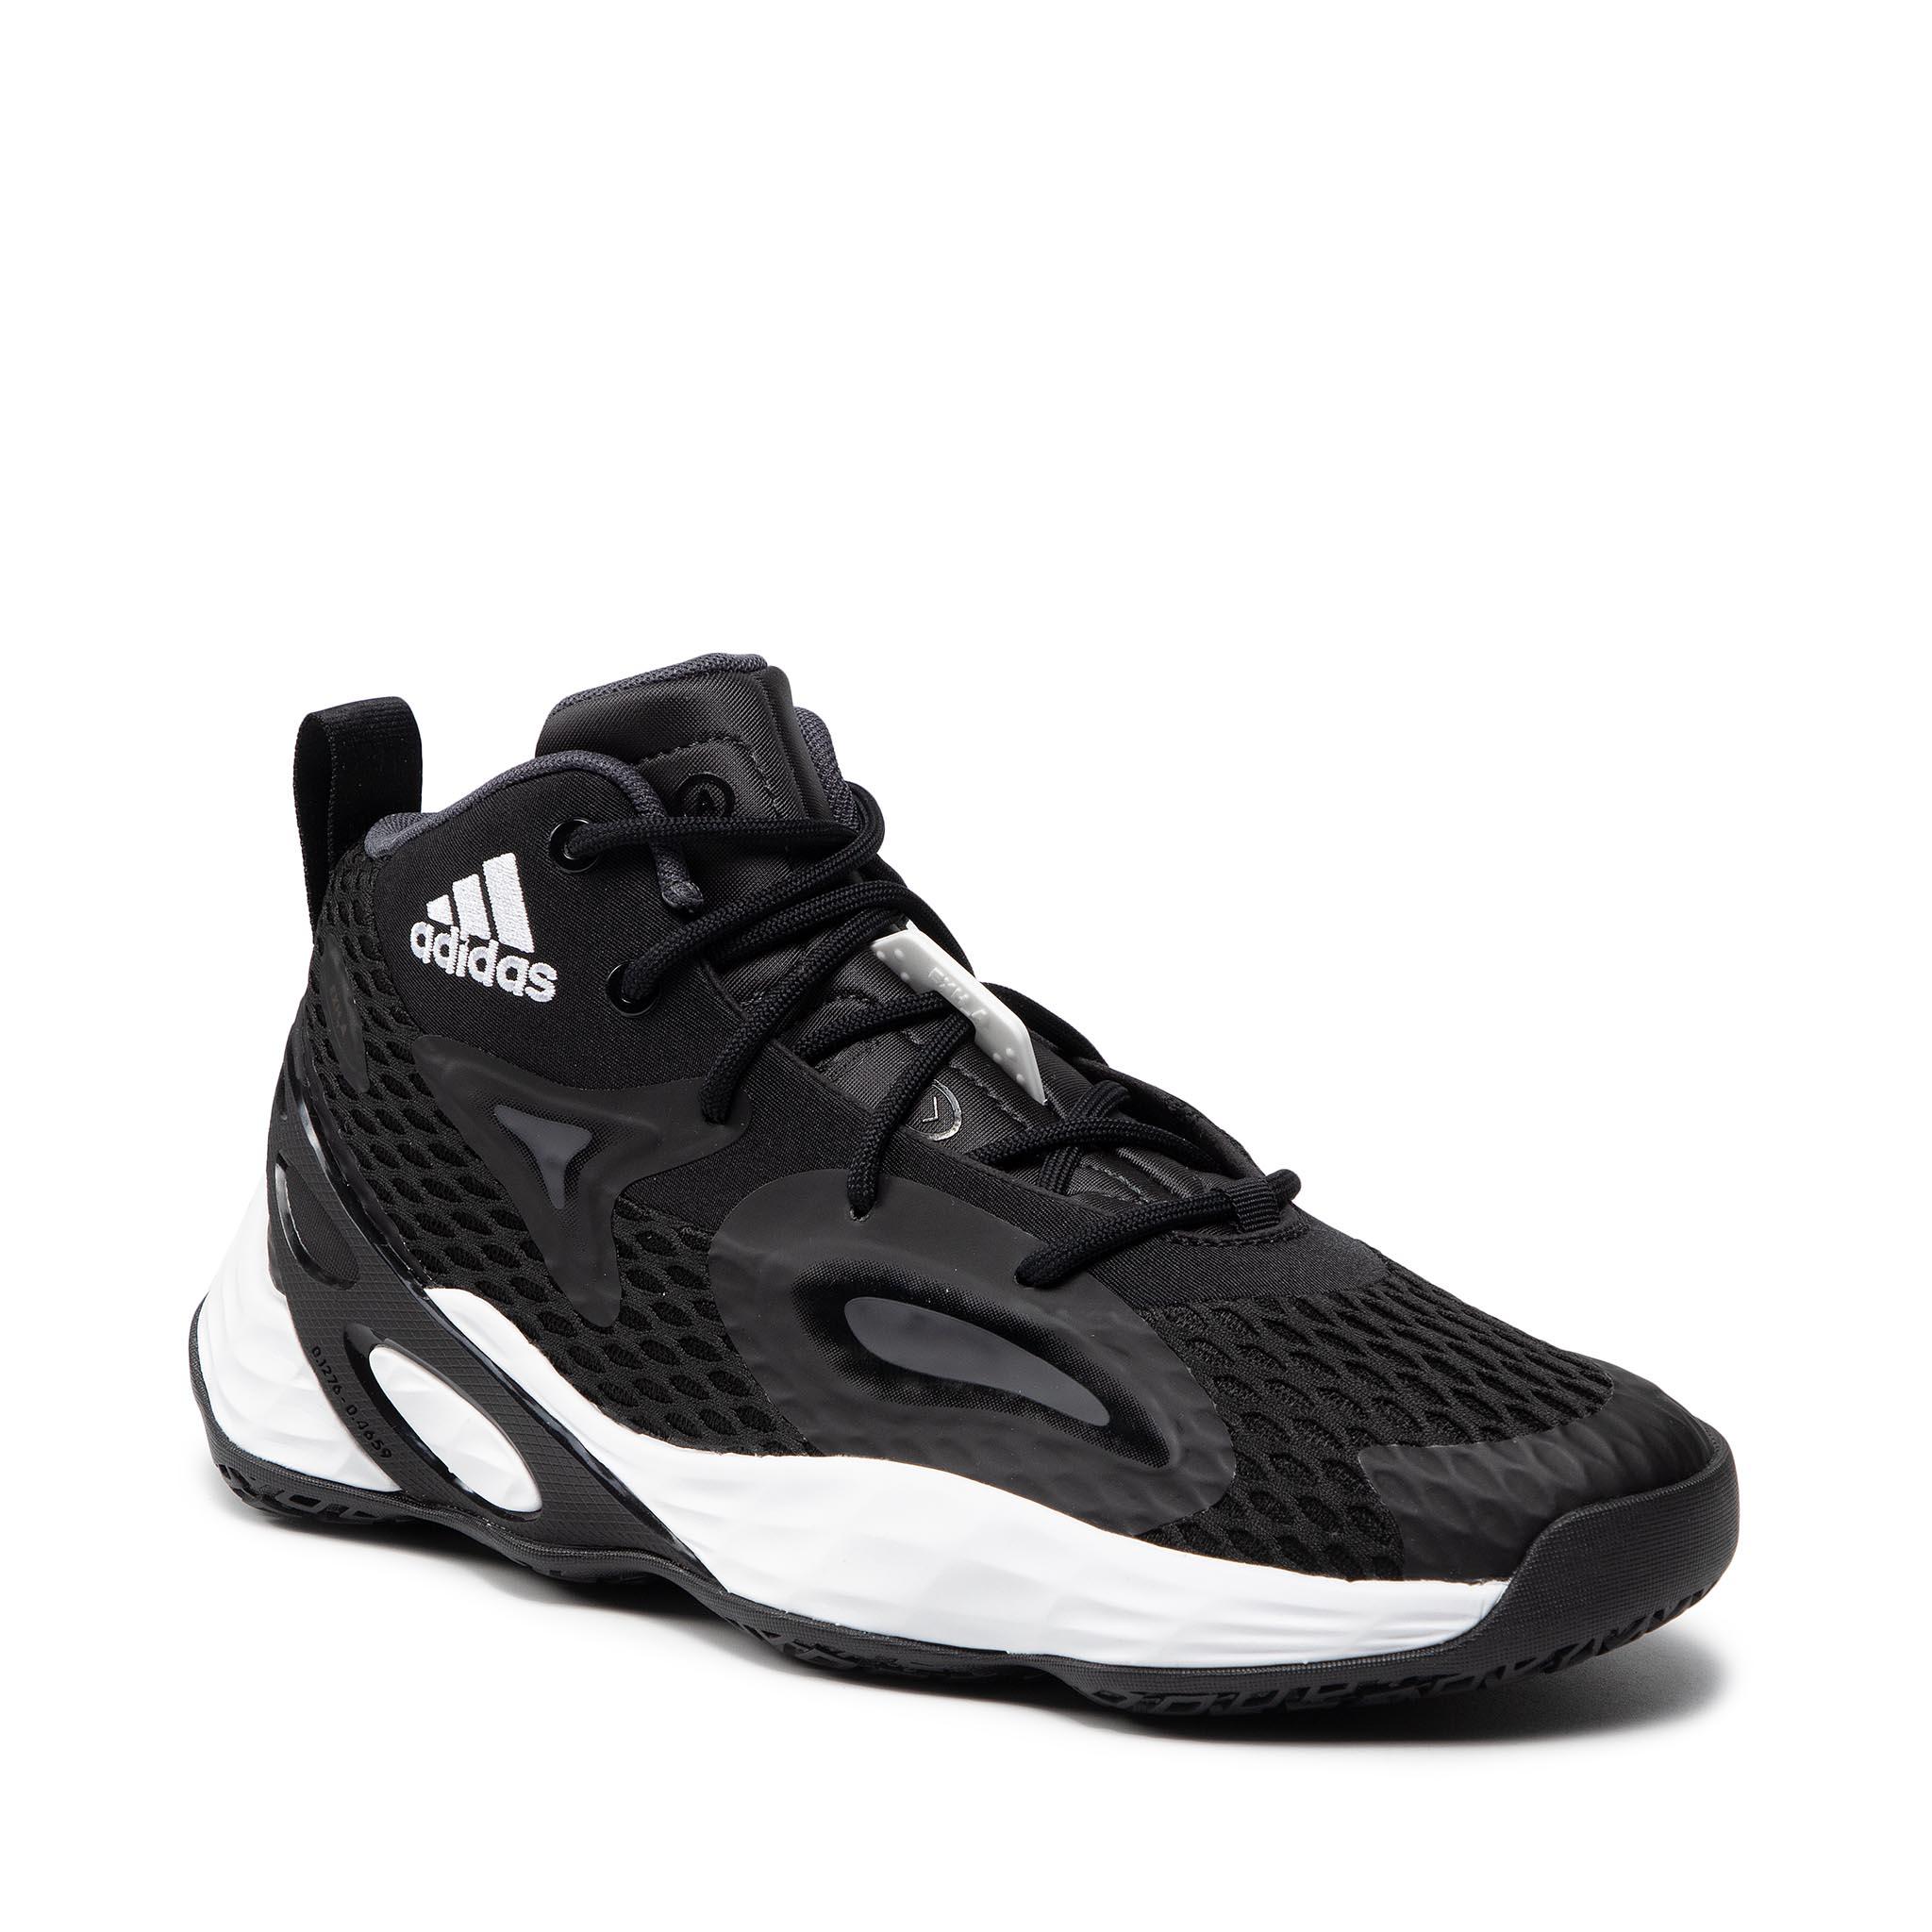 Image of Schuhe adidas - Exhibit A Mid H67747 Cblack/Silvmt/Tmdrgr